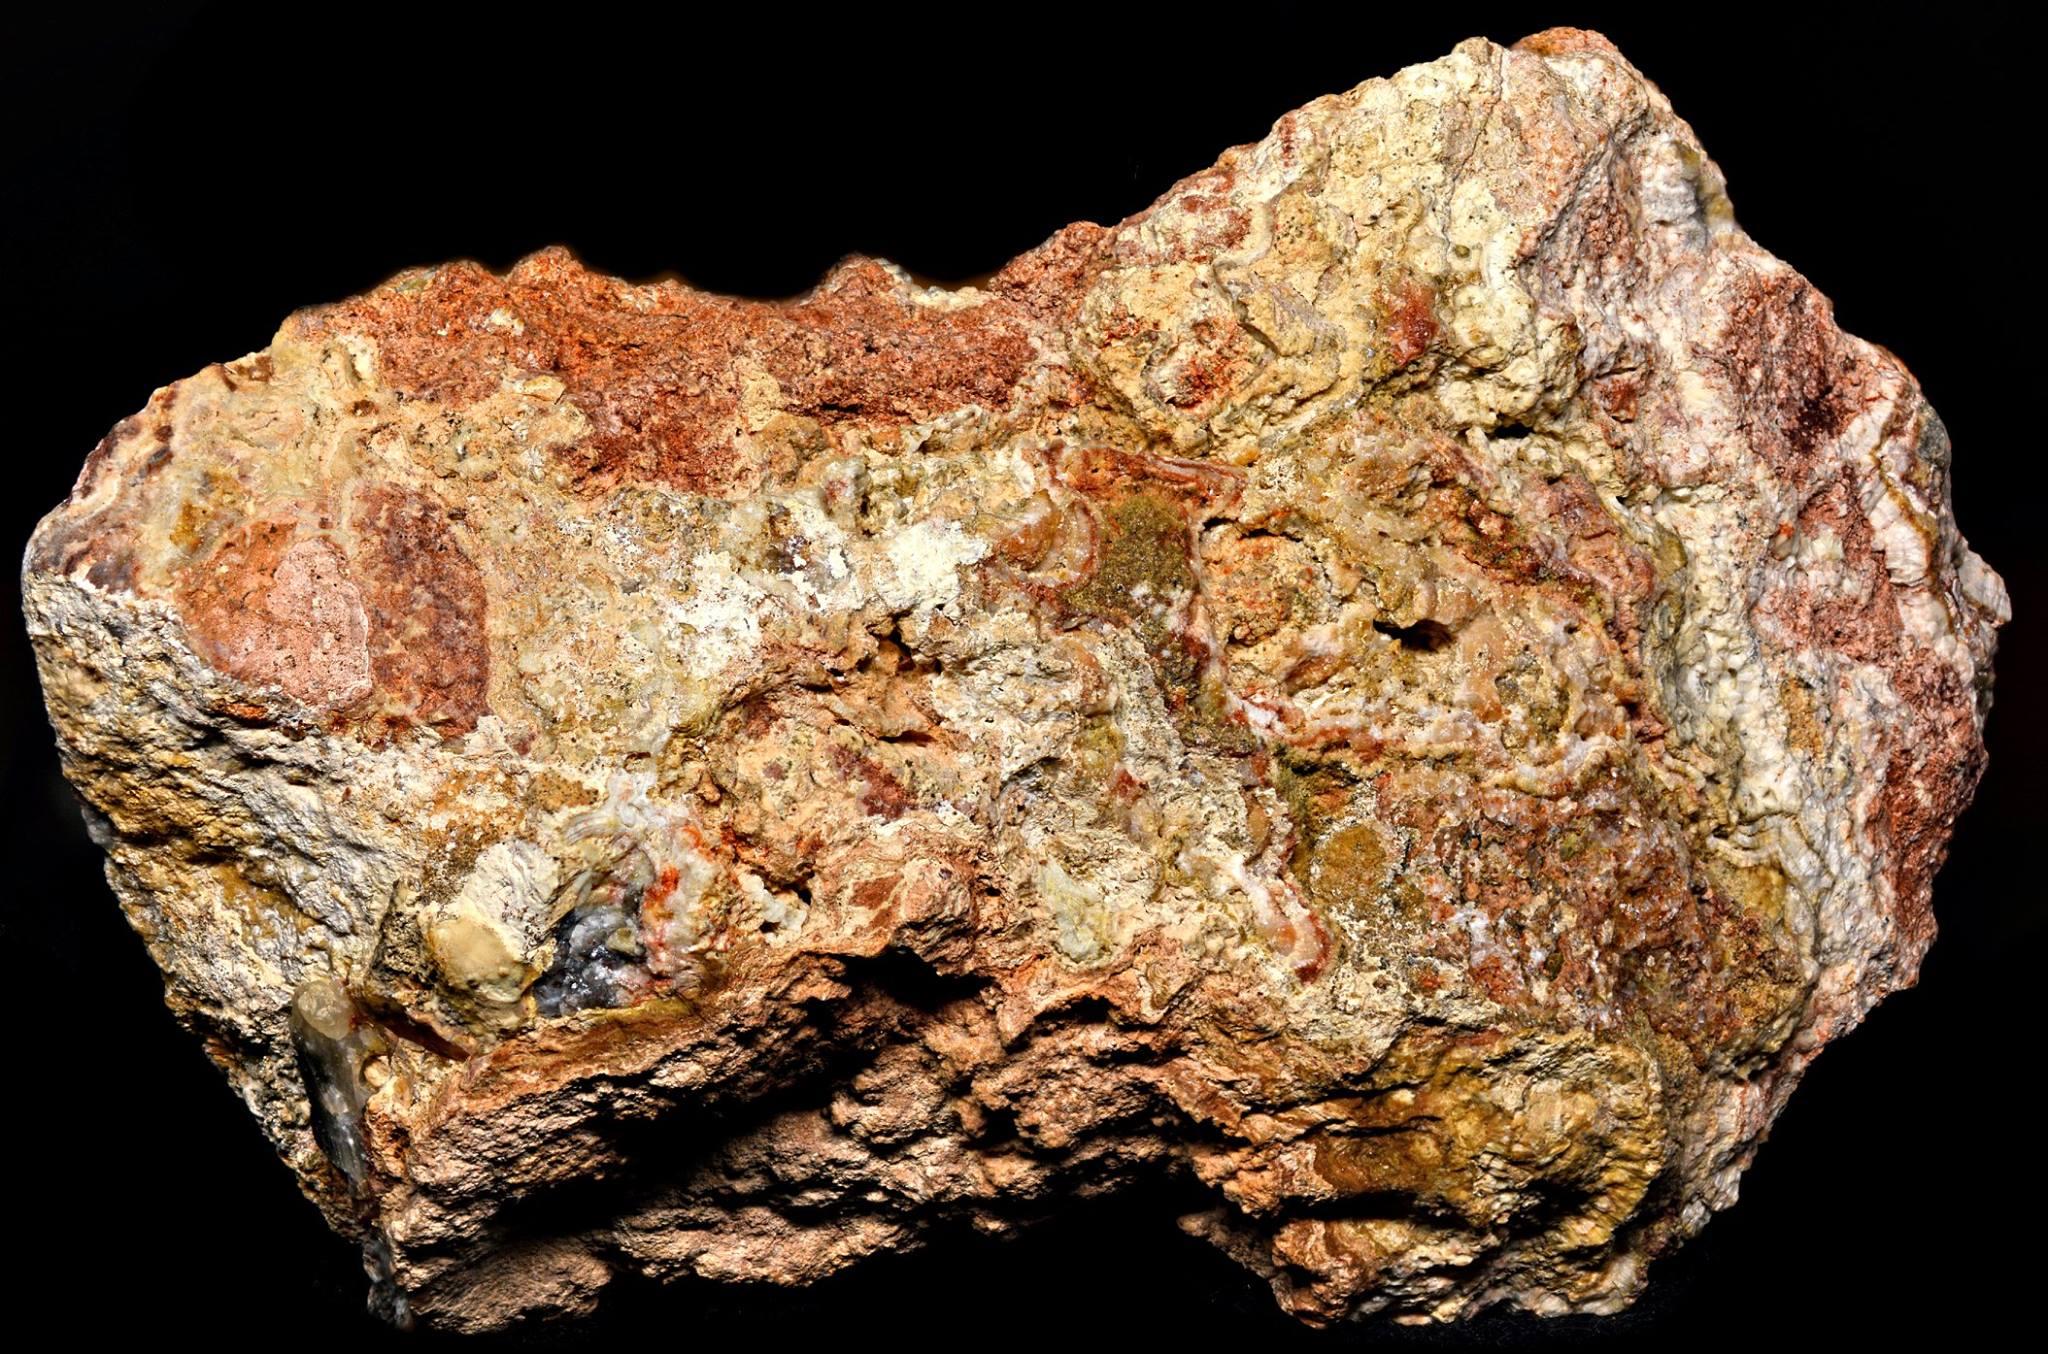 Third Plain Zinc Prospect natural